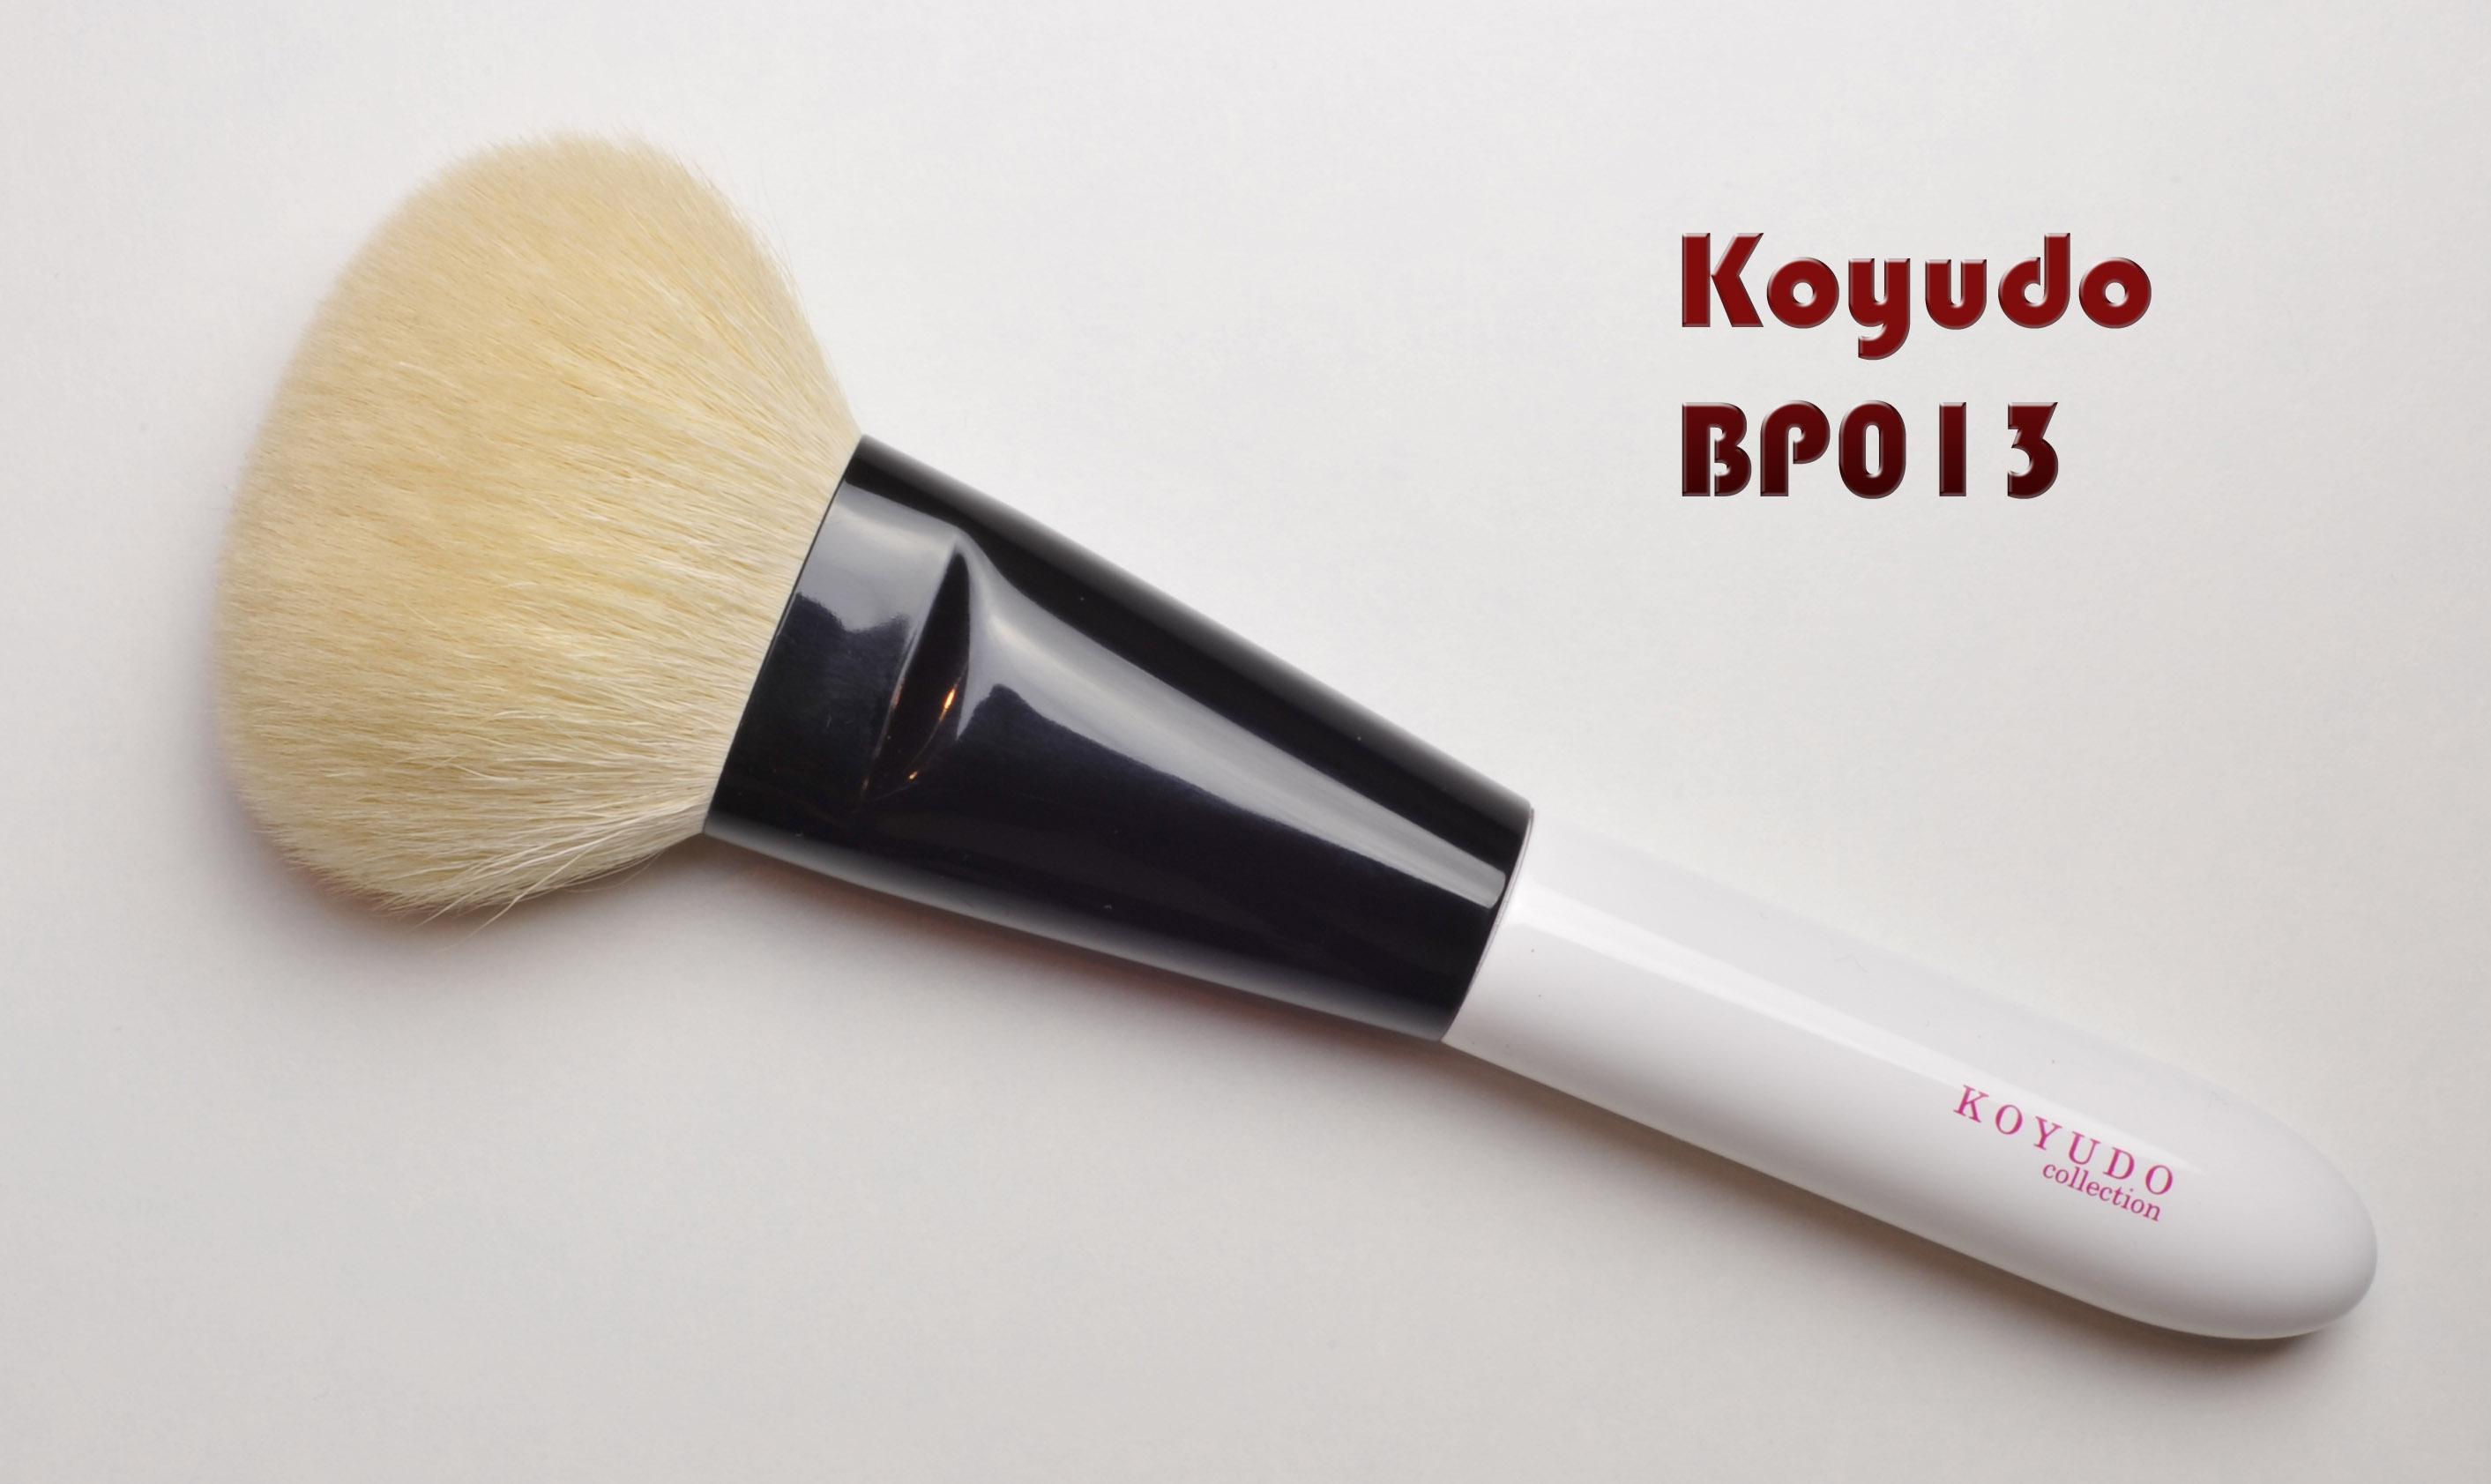 bp013